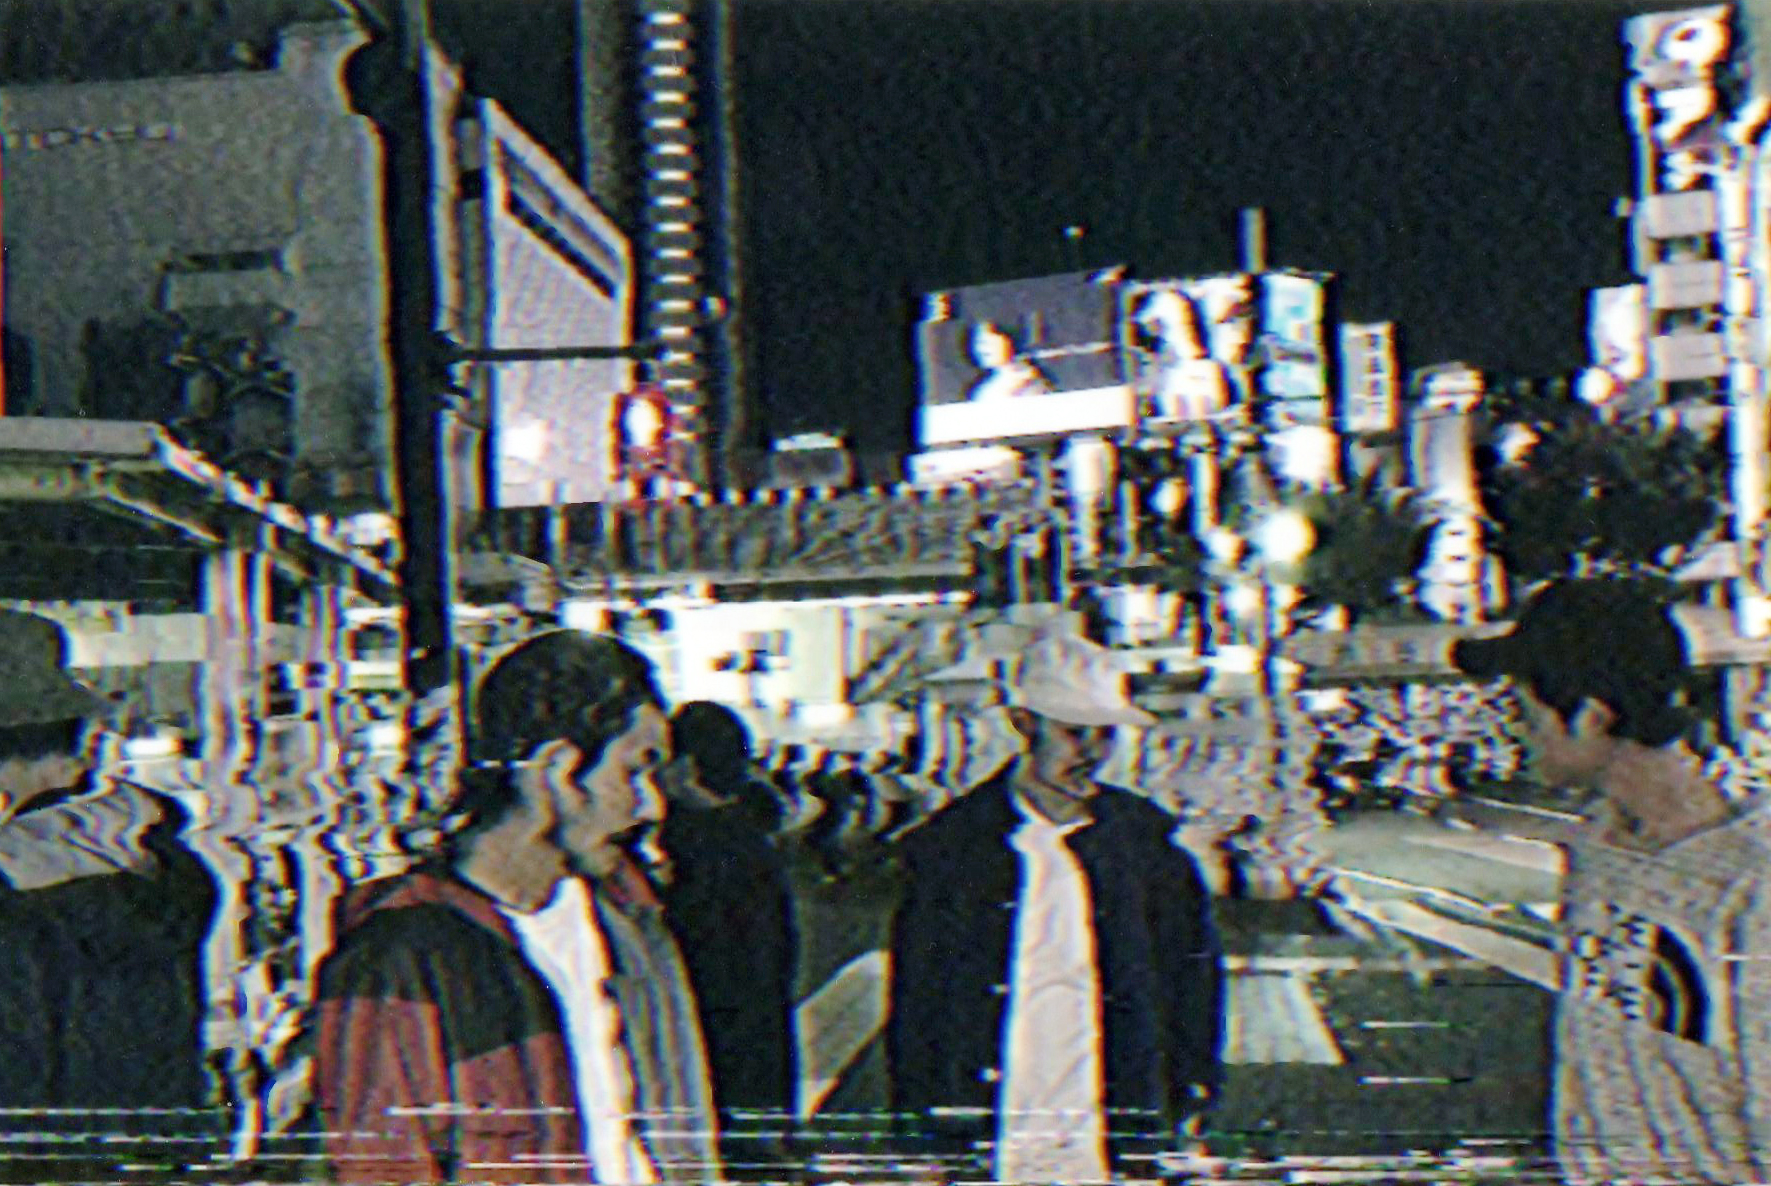 Capture the street view_8.jpg